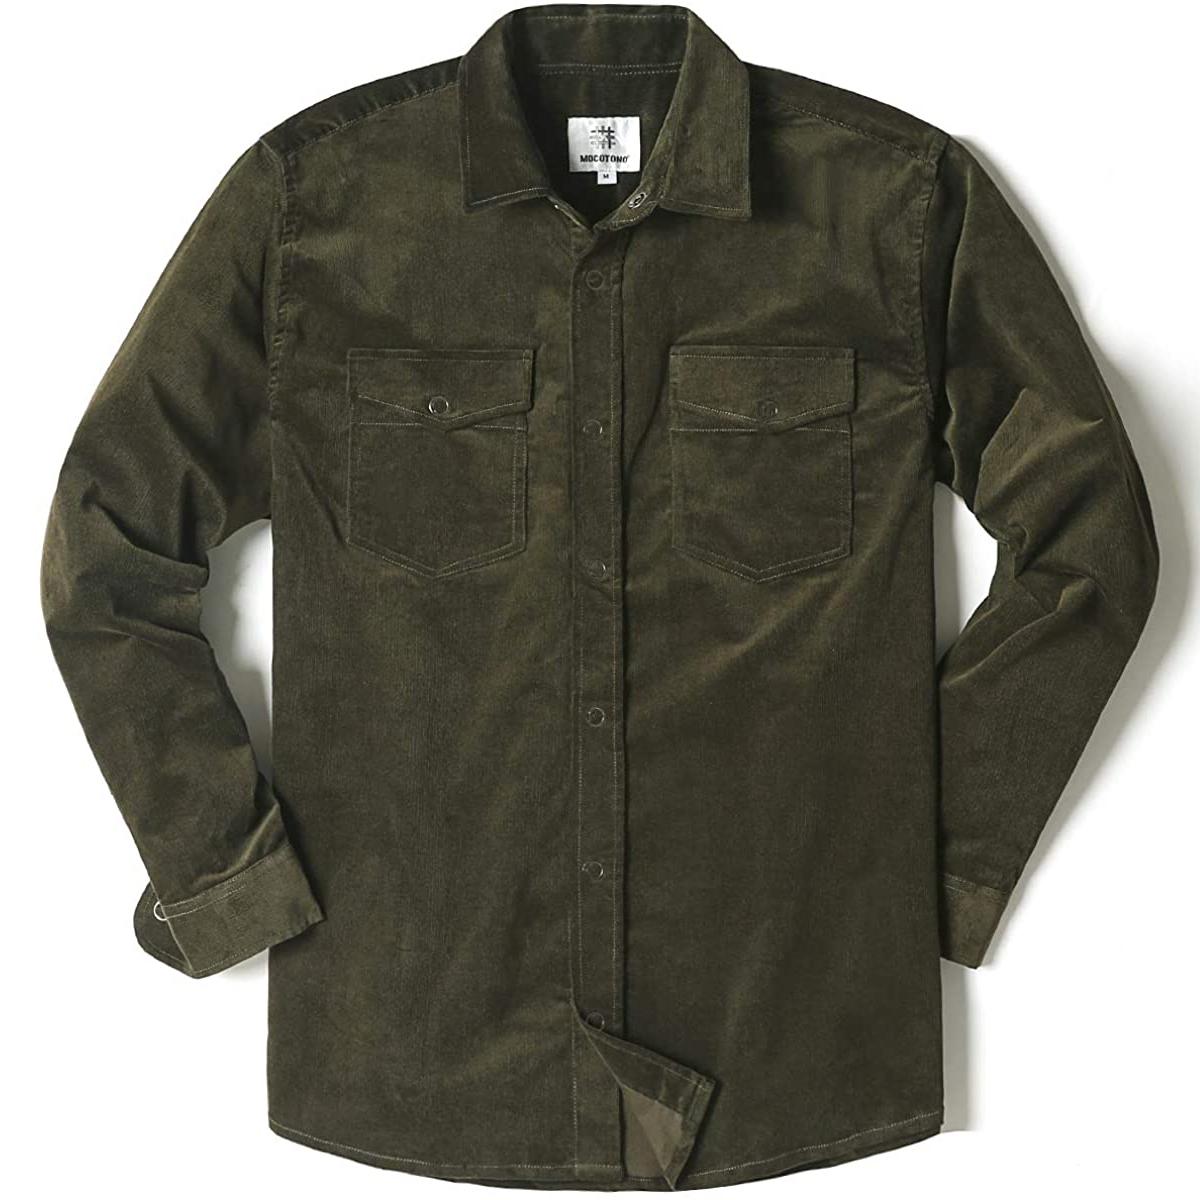 MOCOTONO Long Sleeve Thick Corduroy Shirt